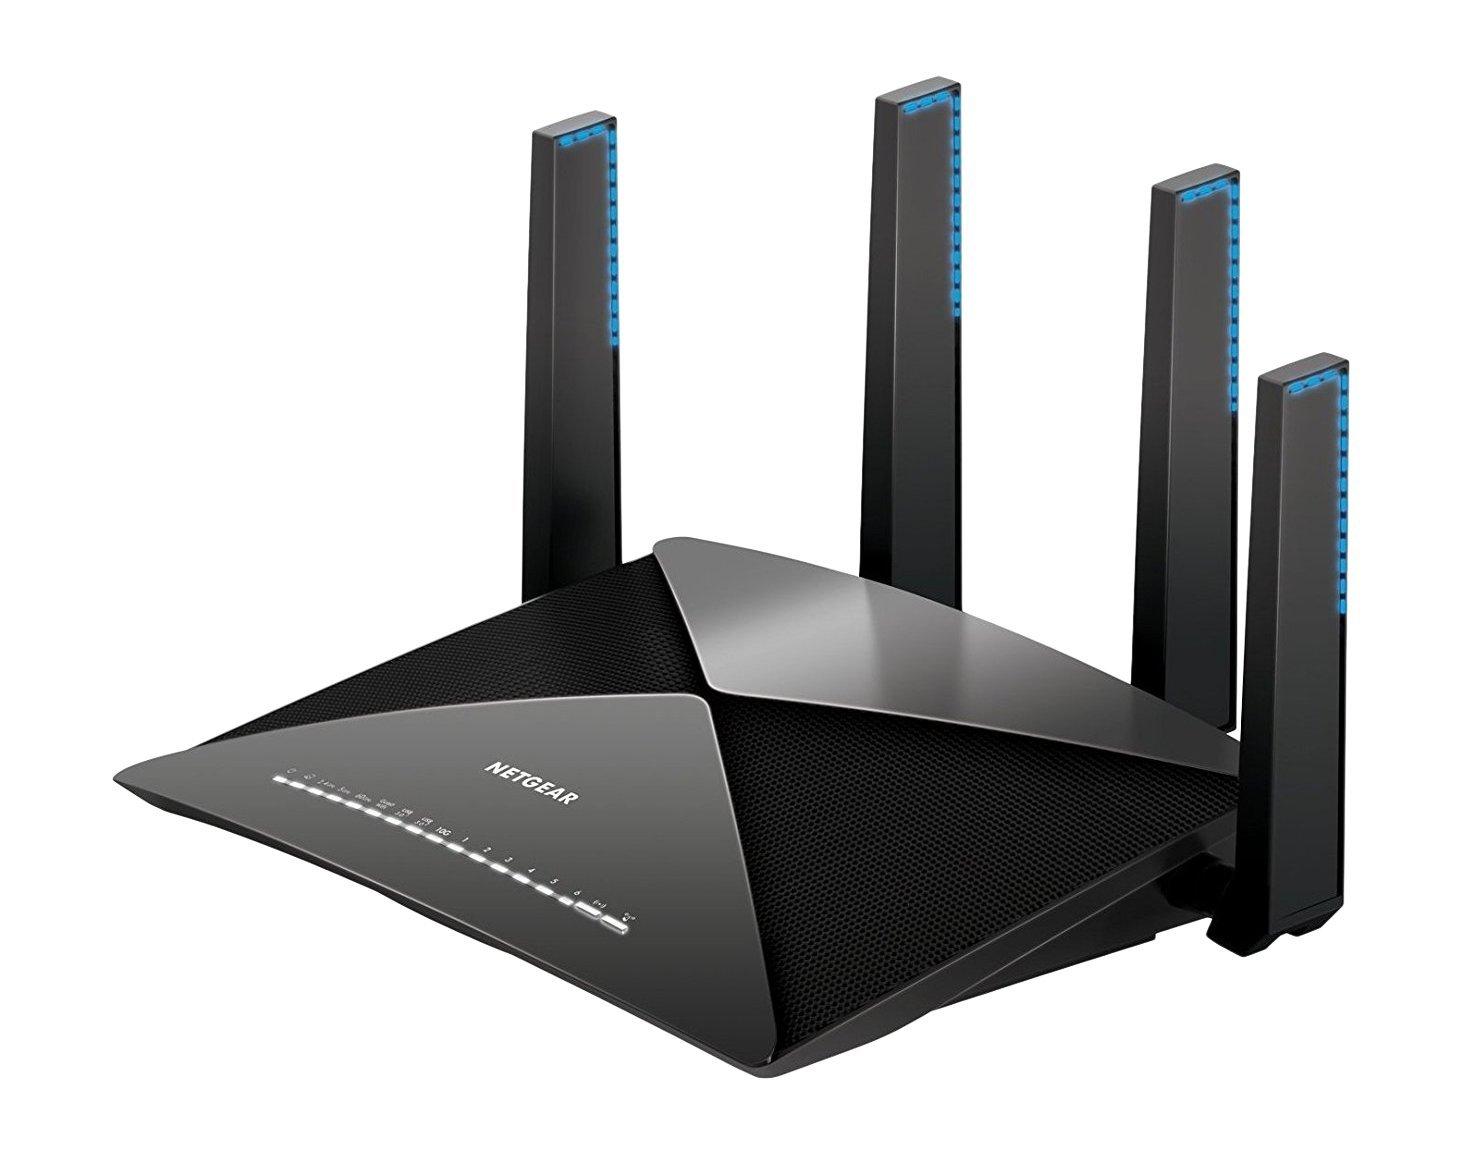 Netgear Nighthawk R9000-100EUS AD7200 Tri-Band Gigabit WLAN Router (funktioniert mit Alexa, 2 x 3.0 USB Ports, MU-MIMO, 1,7 Ghz Quad Core Prozessor, App-Managed, und 10G SFP+ Port) schwarz